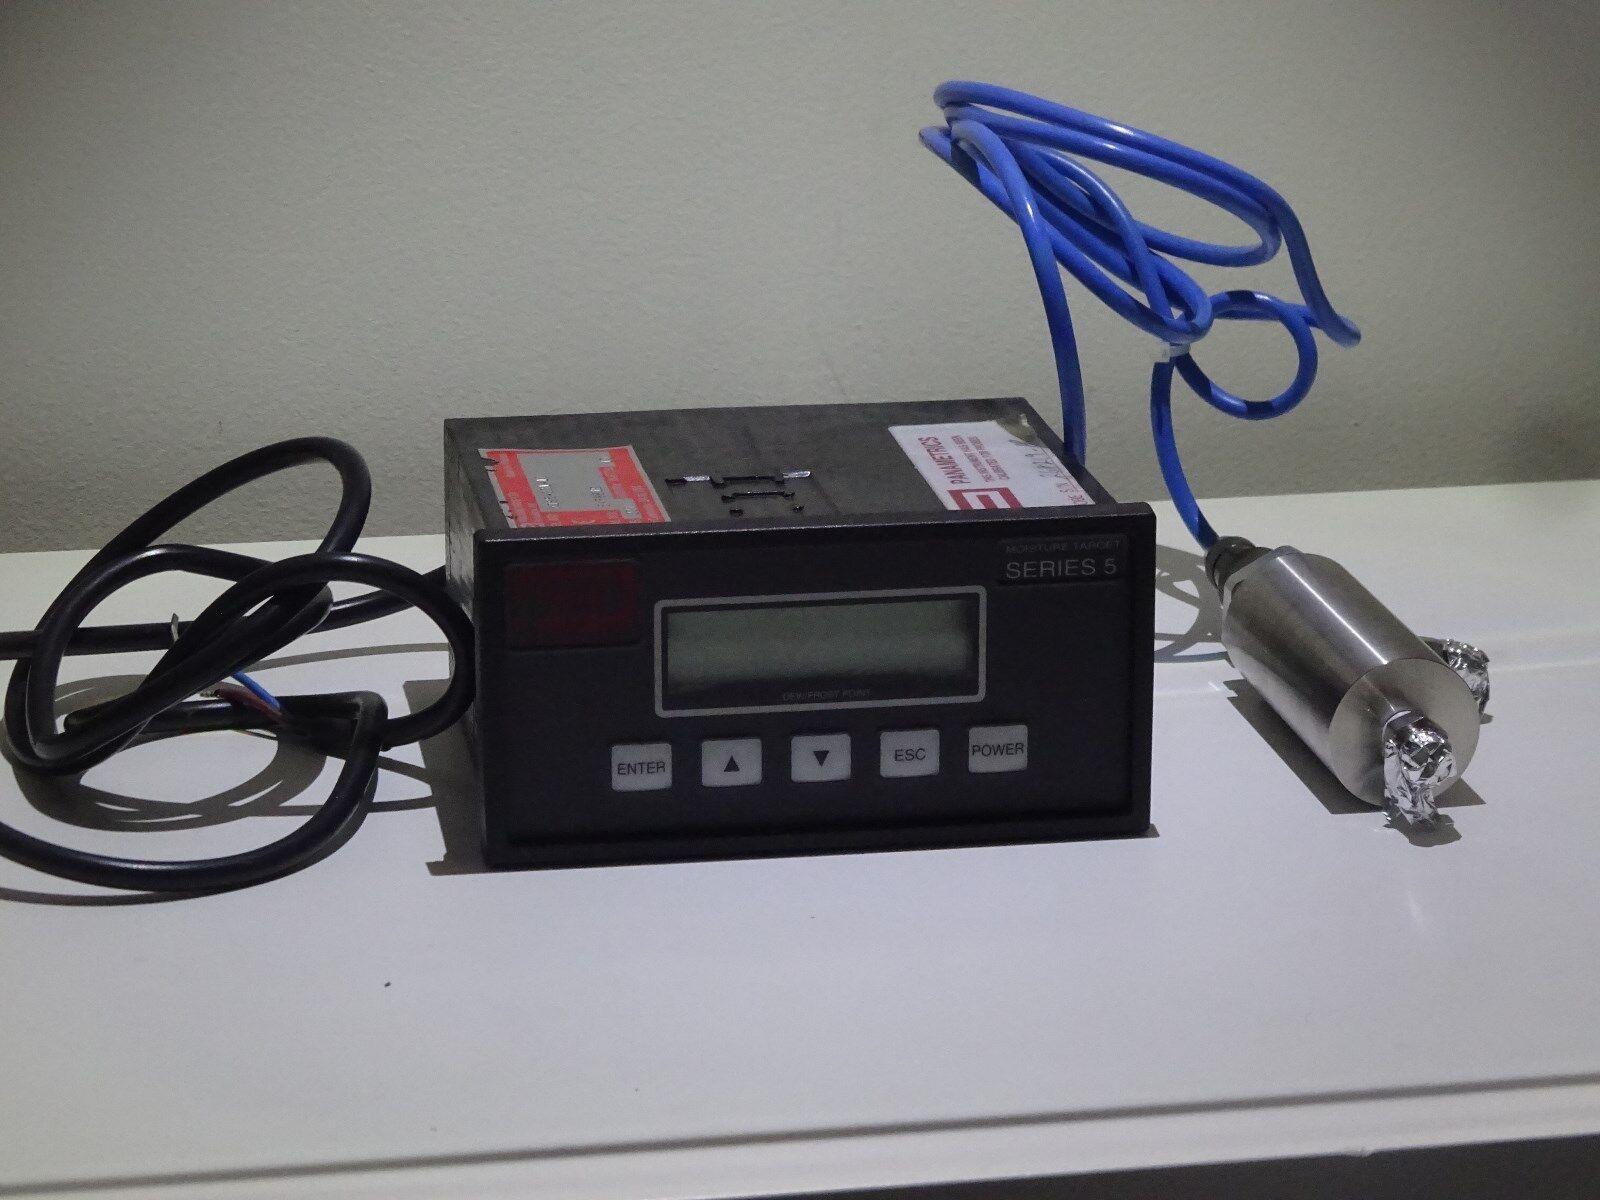 GE Sensing hygrometre Moisture Monitor panametrics Series 5 with Probe   Cable